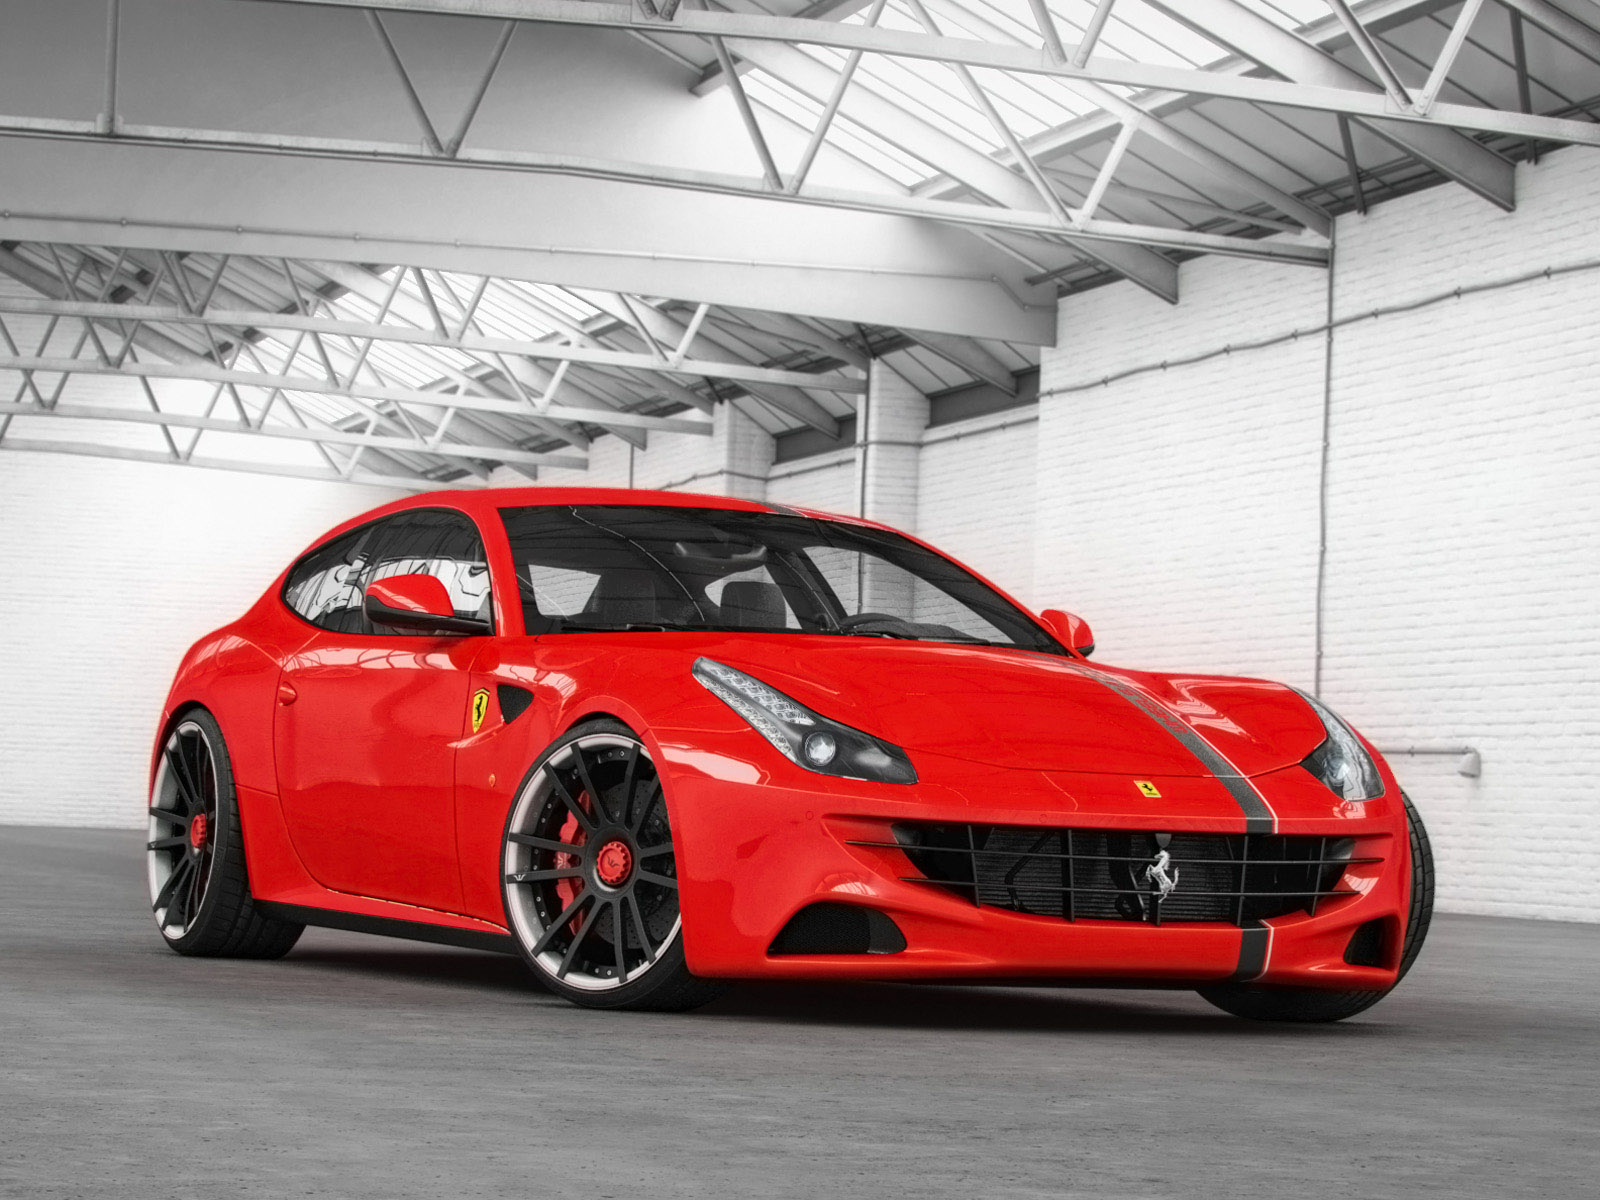 2014 Ferrari La Famiglia Fiwe FF - Wheelsandmore